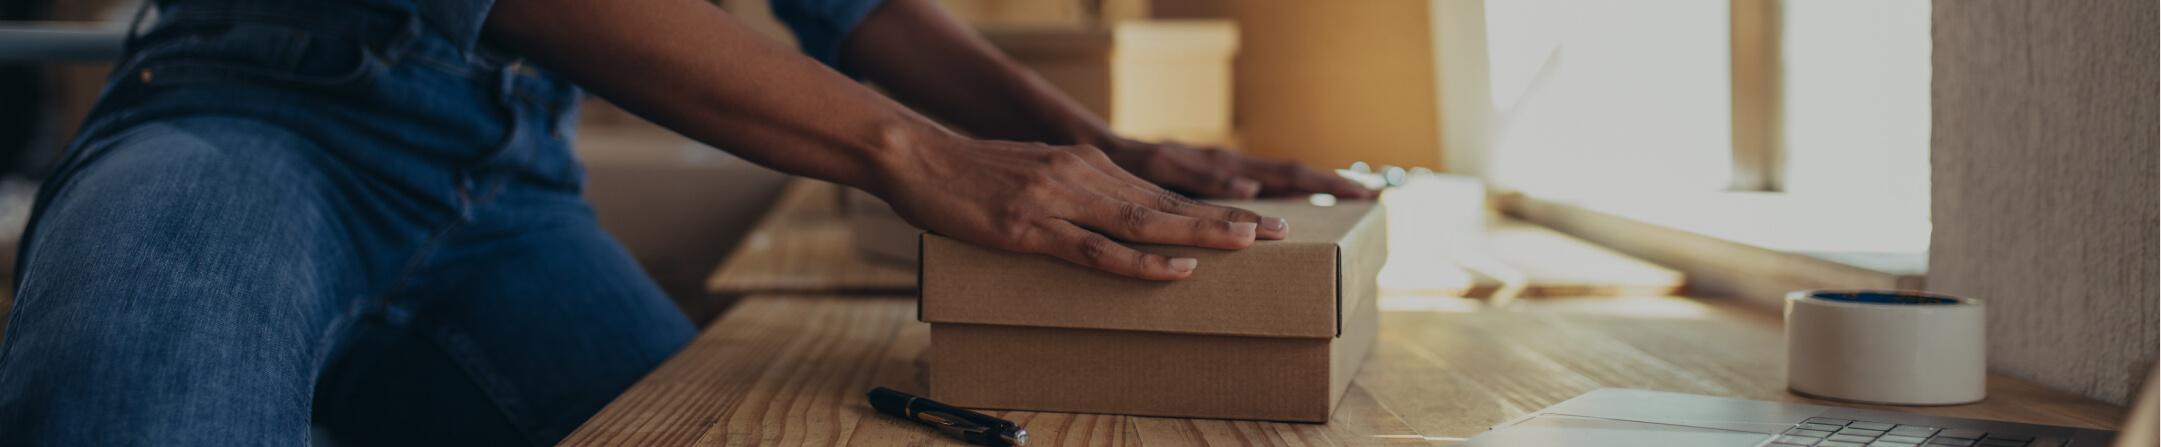 A person closing a brown box on a desk